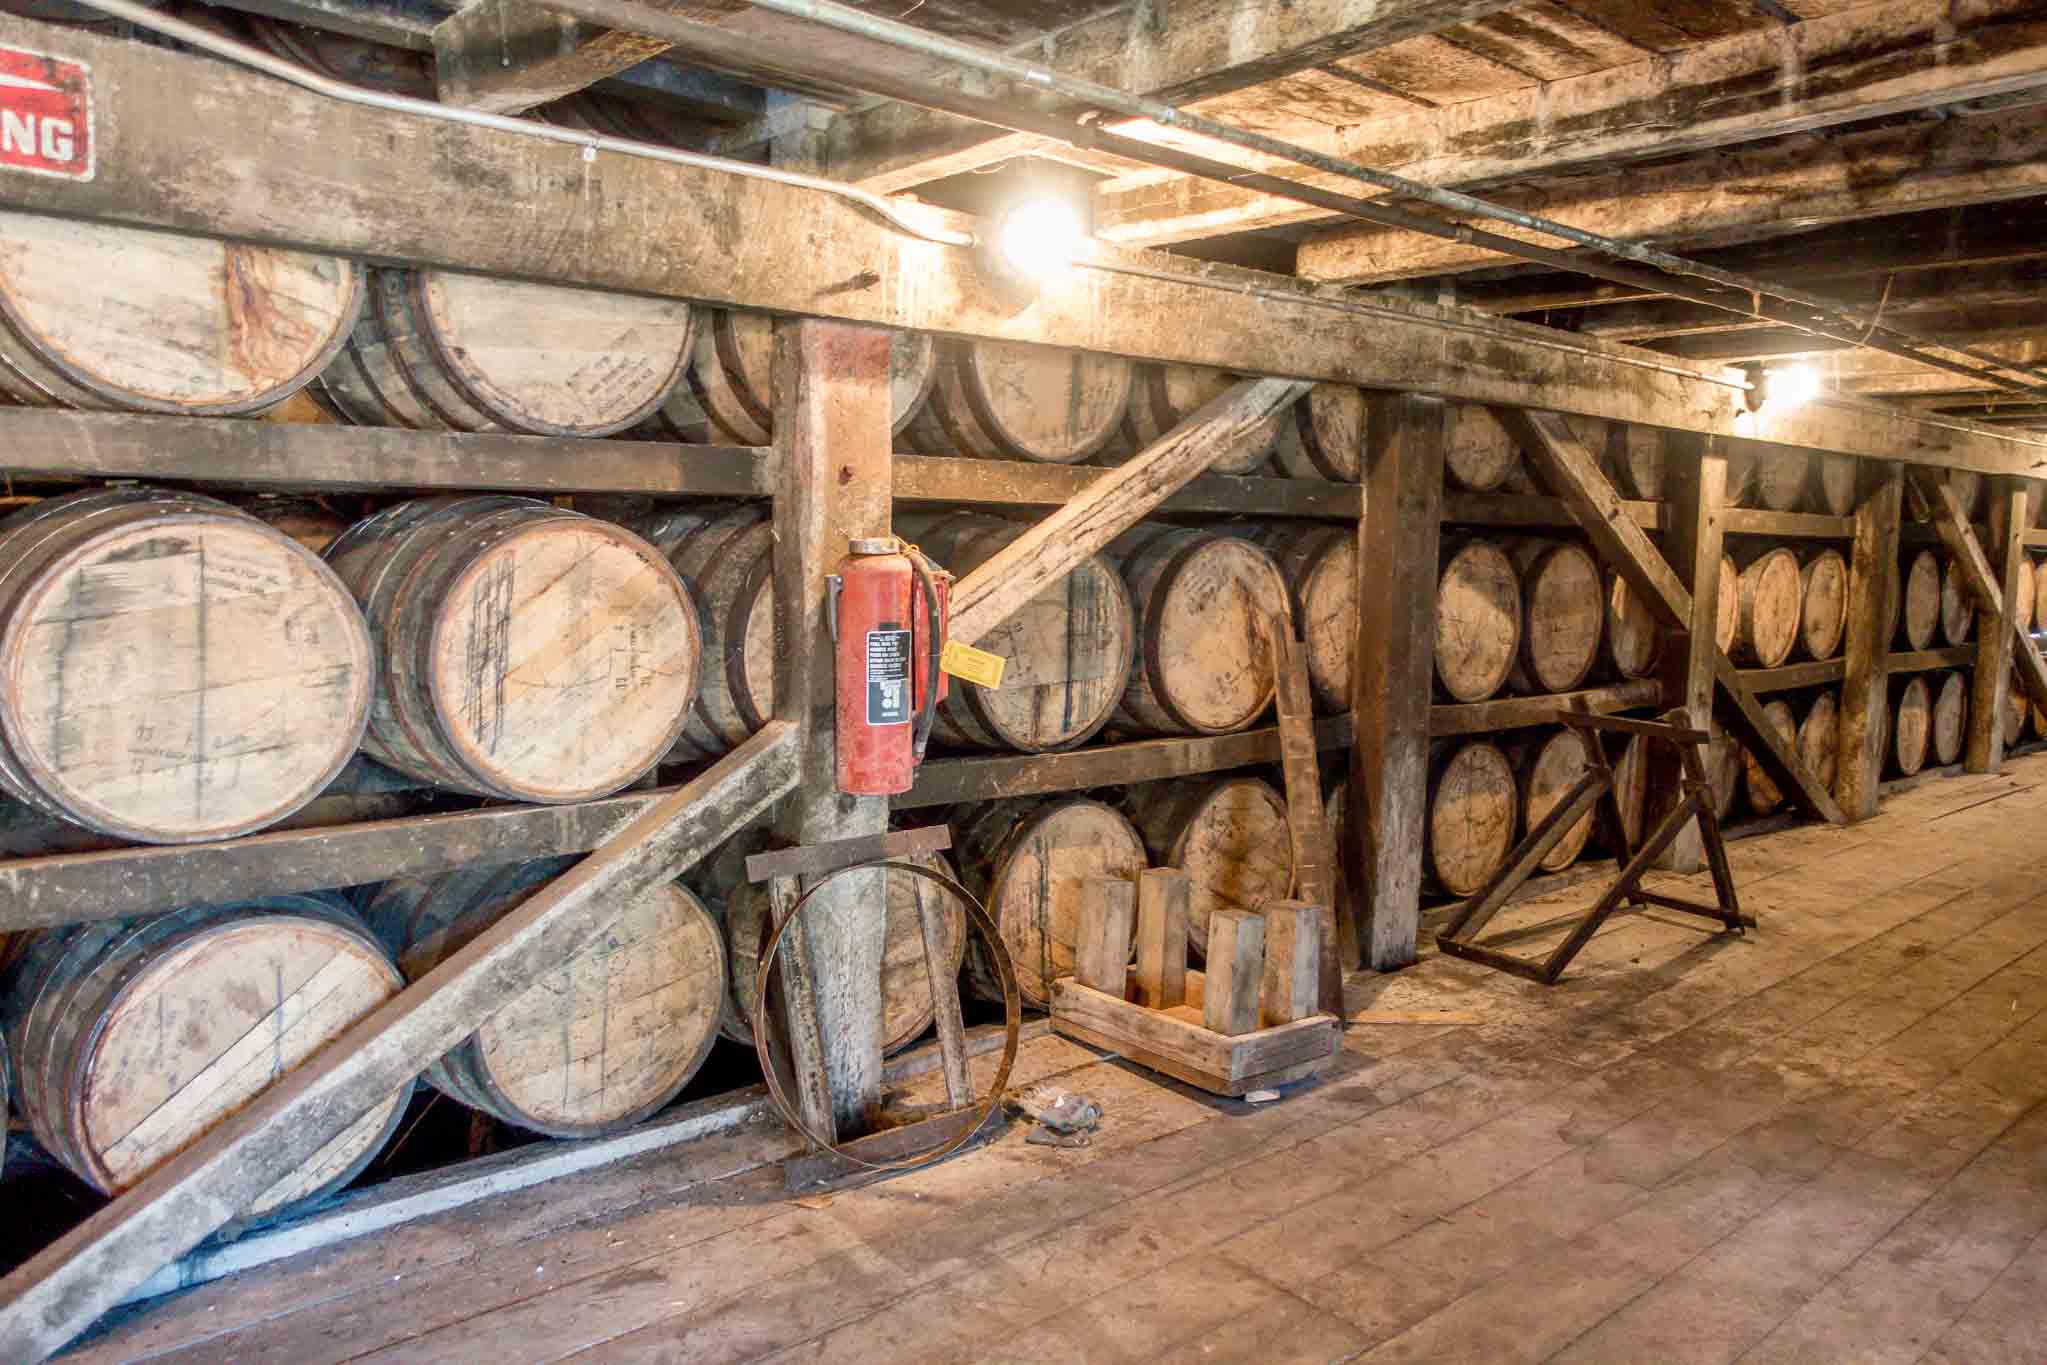 Whiskey barrels in storage at Jack Daniels distillery in Lynchburg Tennessee